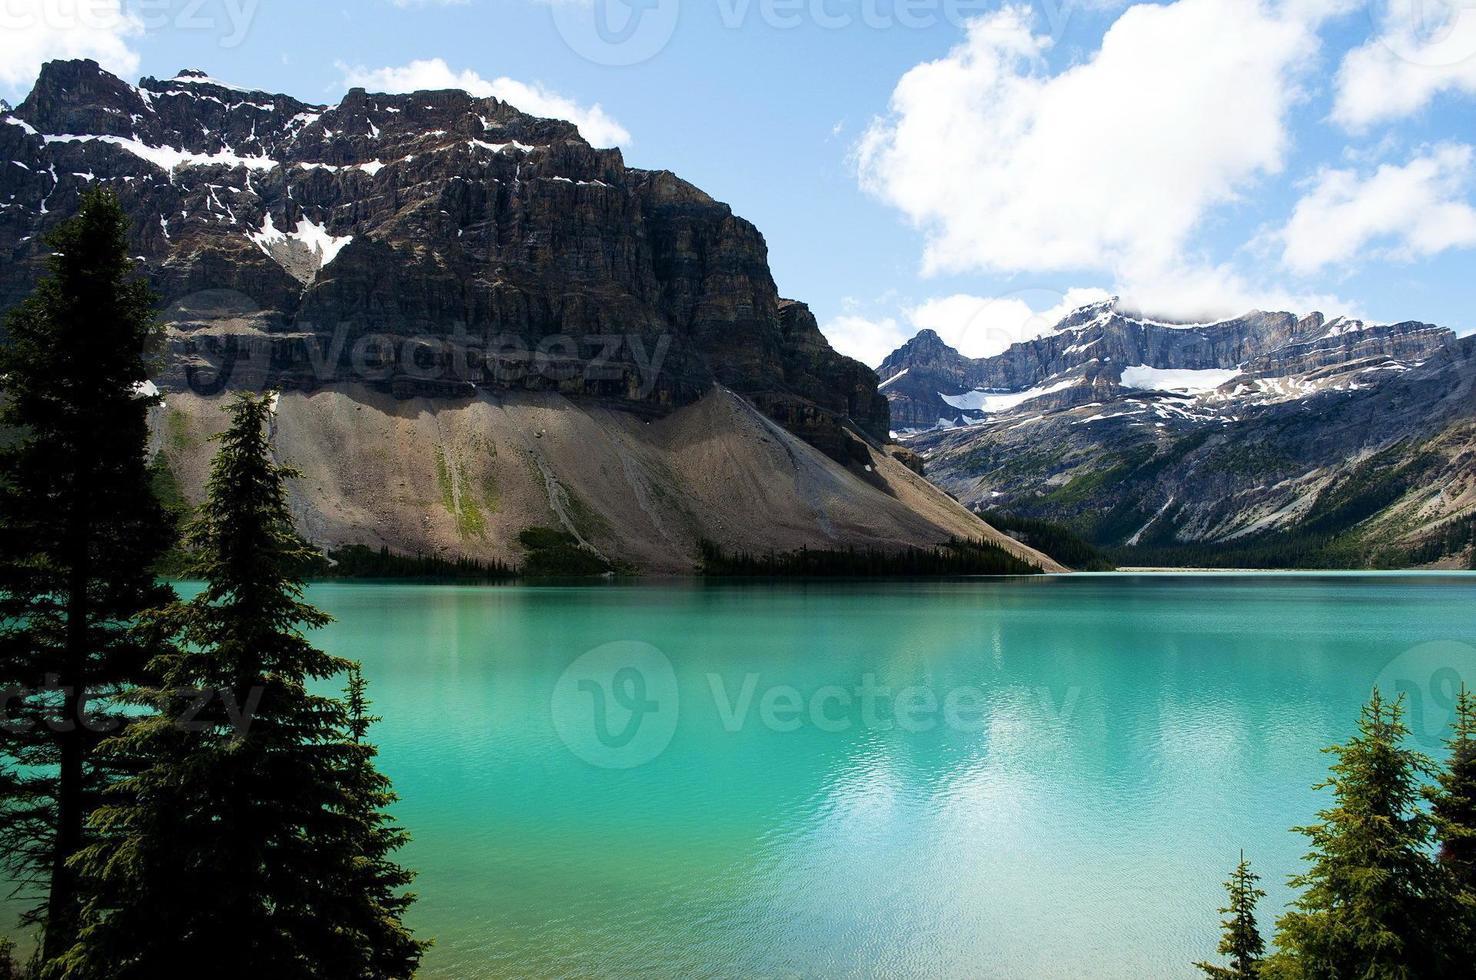 lake louise alberta med stenig moutain och blåesky i bakgrunden foto